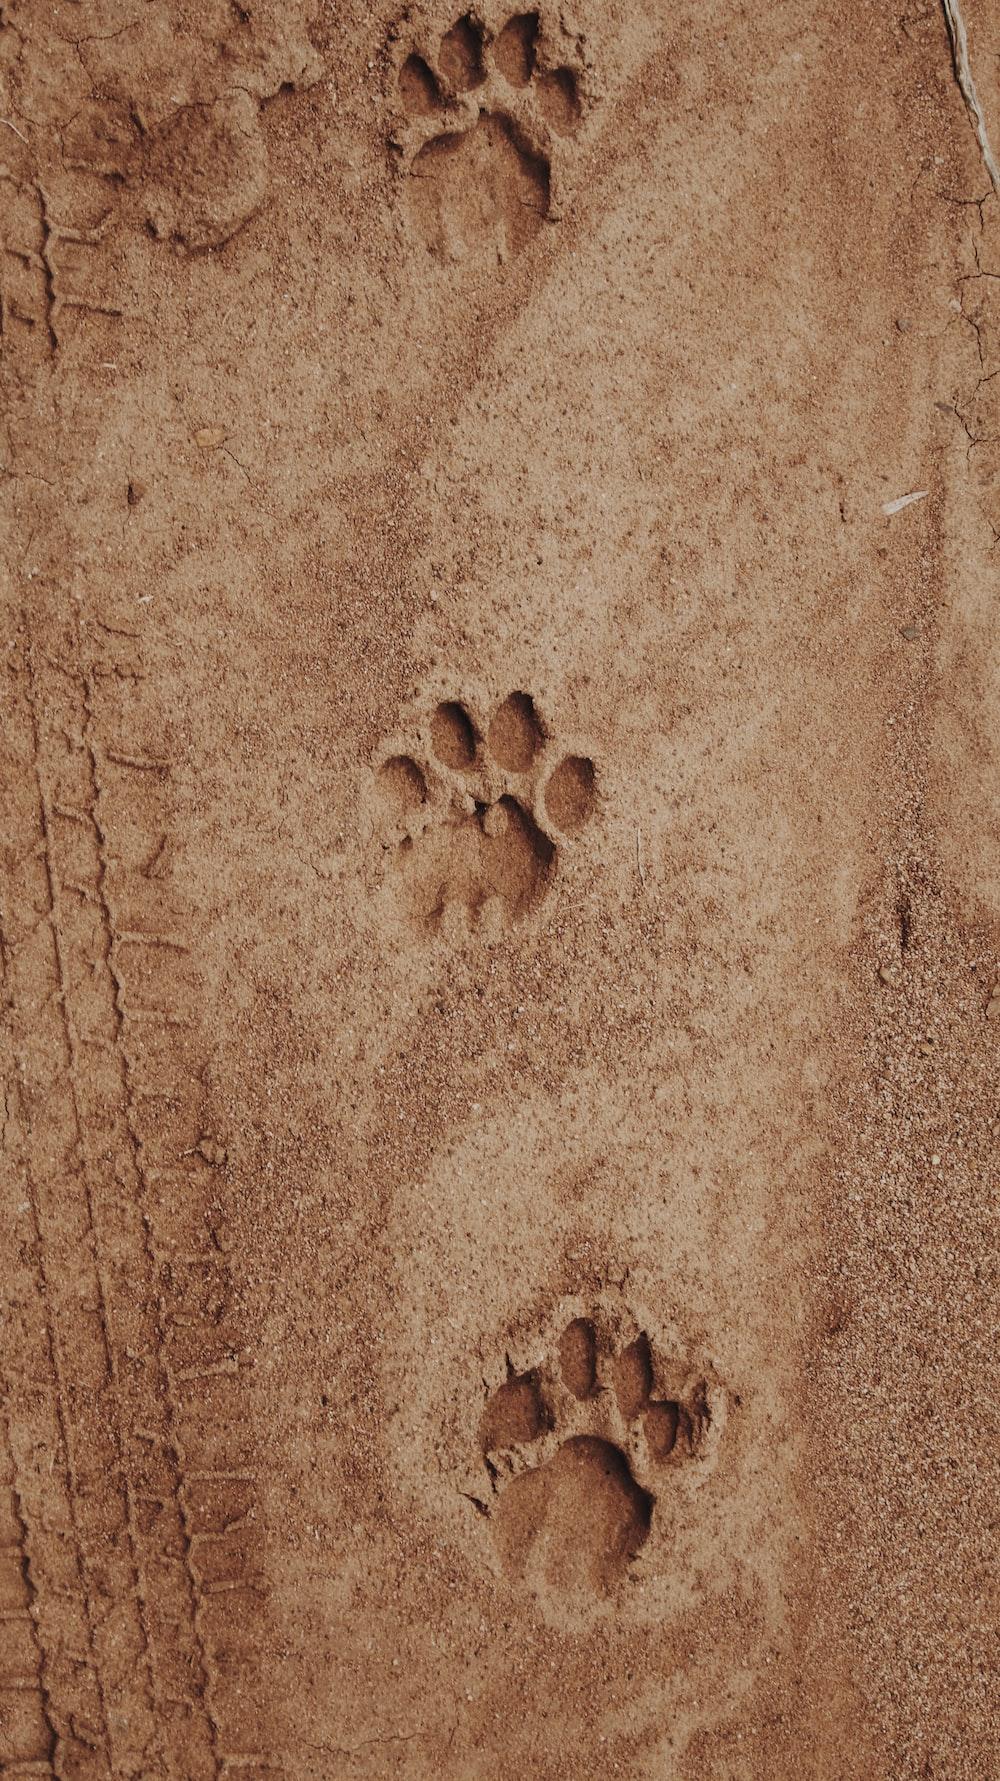 paw print on sand